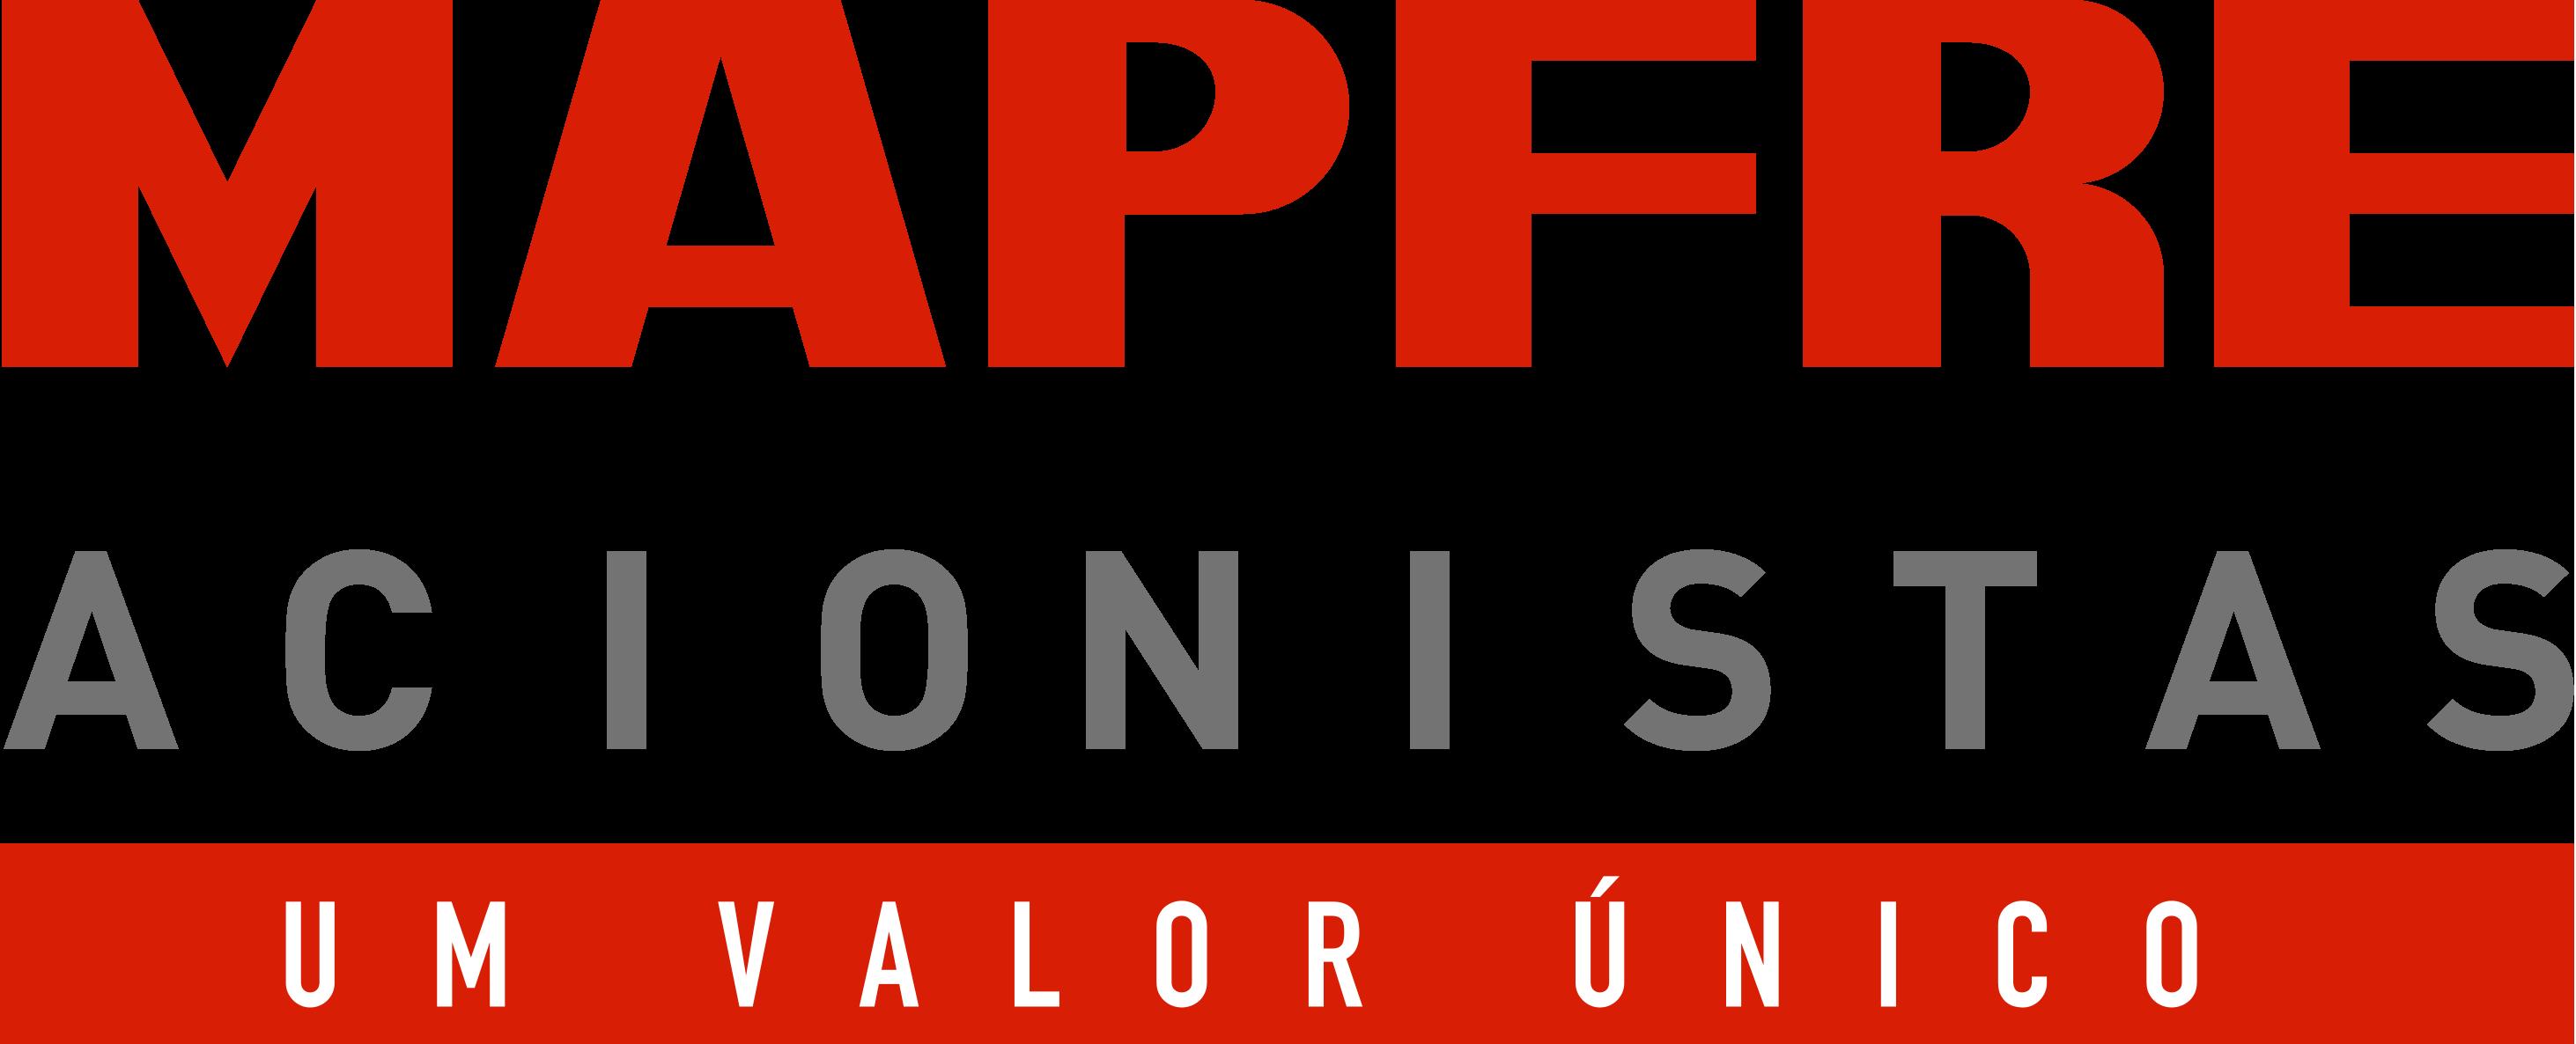 Mapfre Accionistas